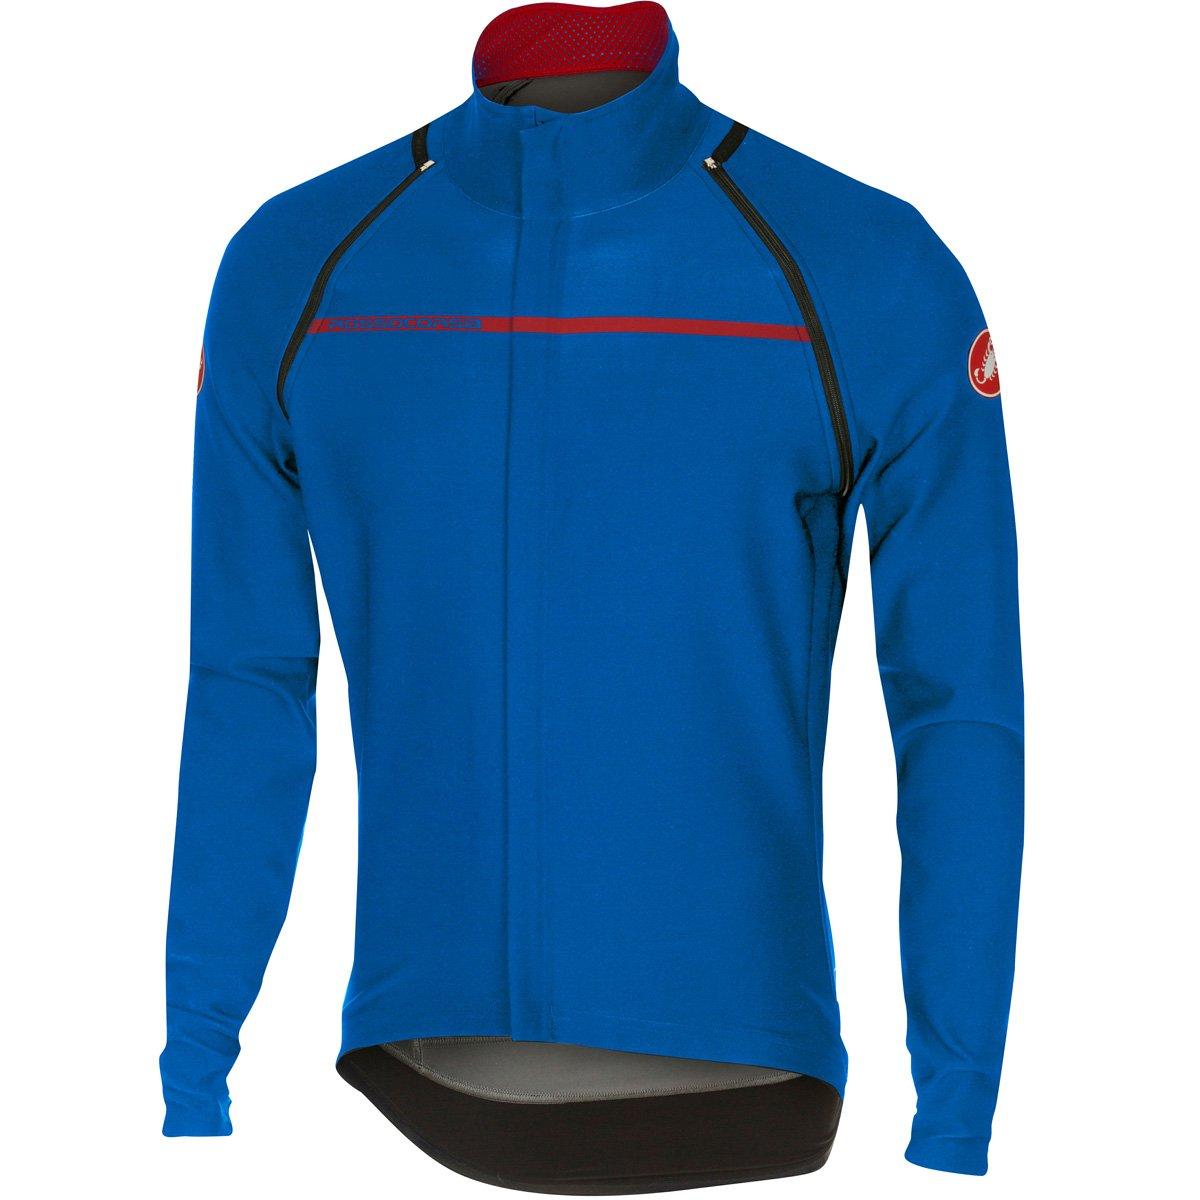 CastelliメンズPerfetto Convertible Cycling Jacket B01L2XQ7UU Small サーフブルー サーフブルー Small